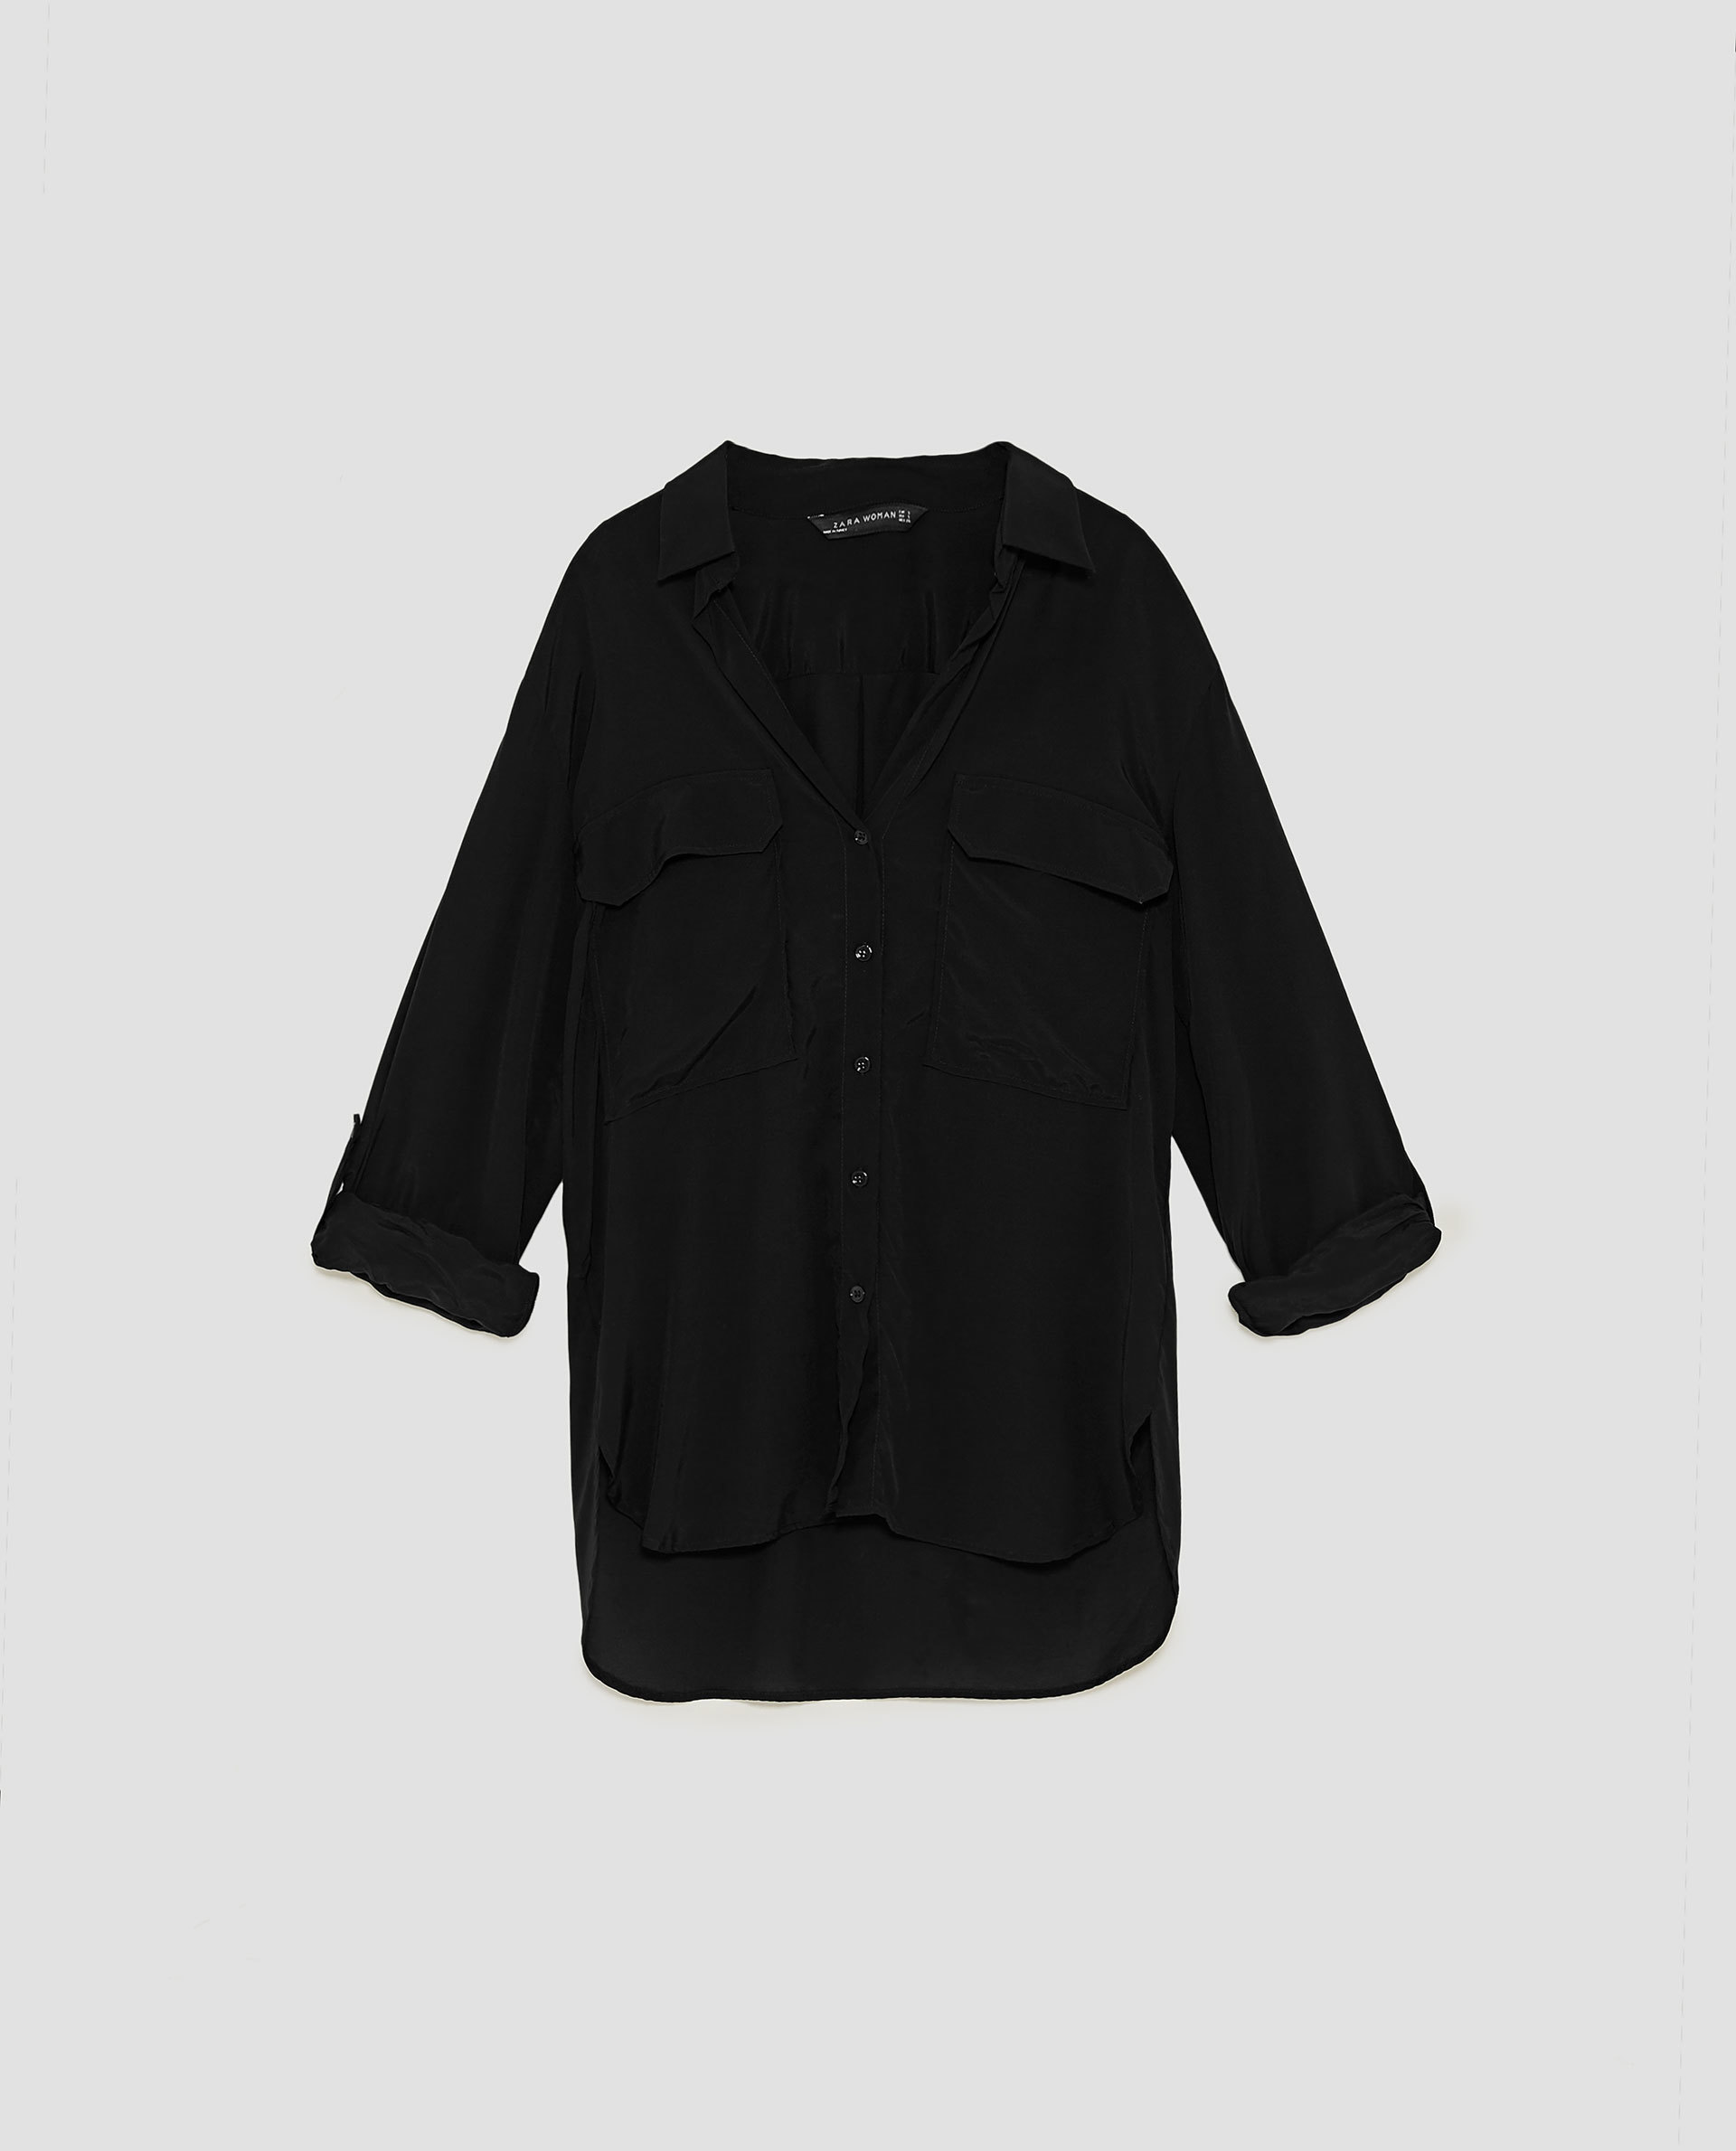 Blusa negra de Zara (29,95 euros).